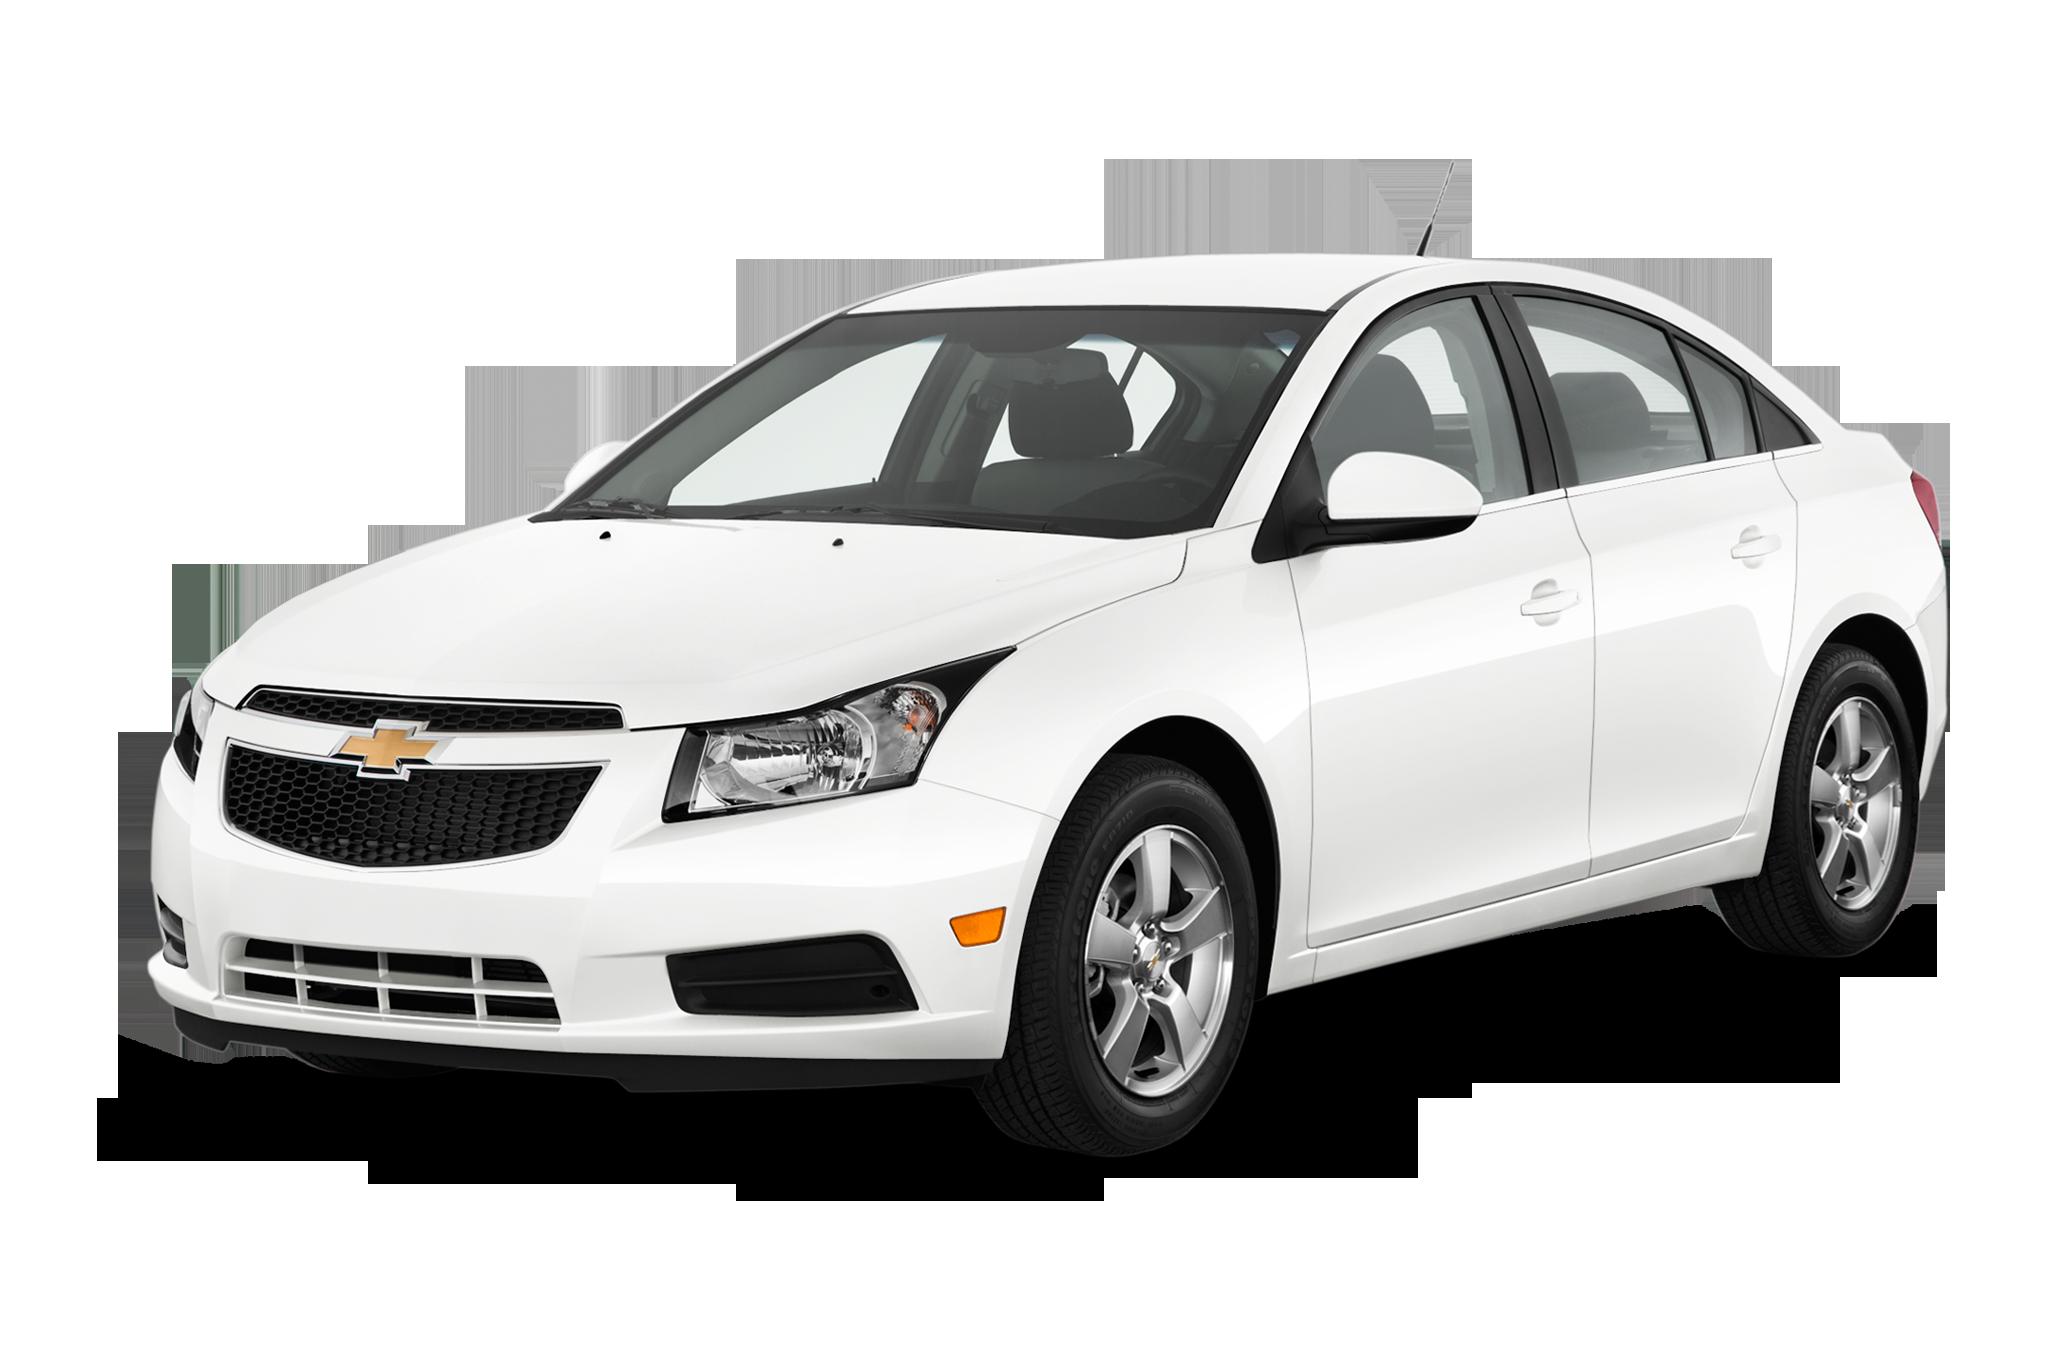 Chevrolet Cruze (09-) (J300)